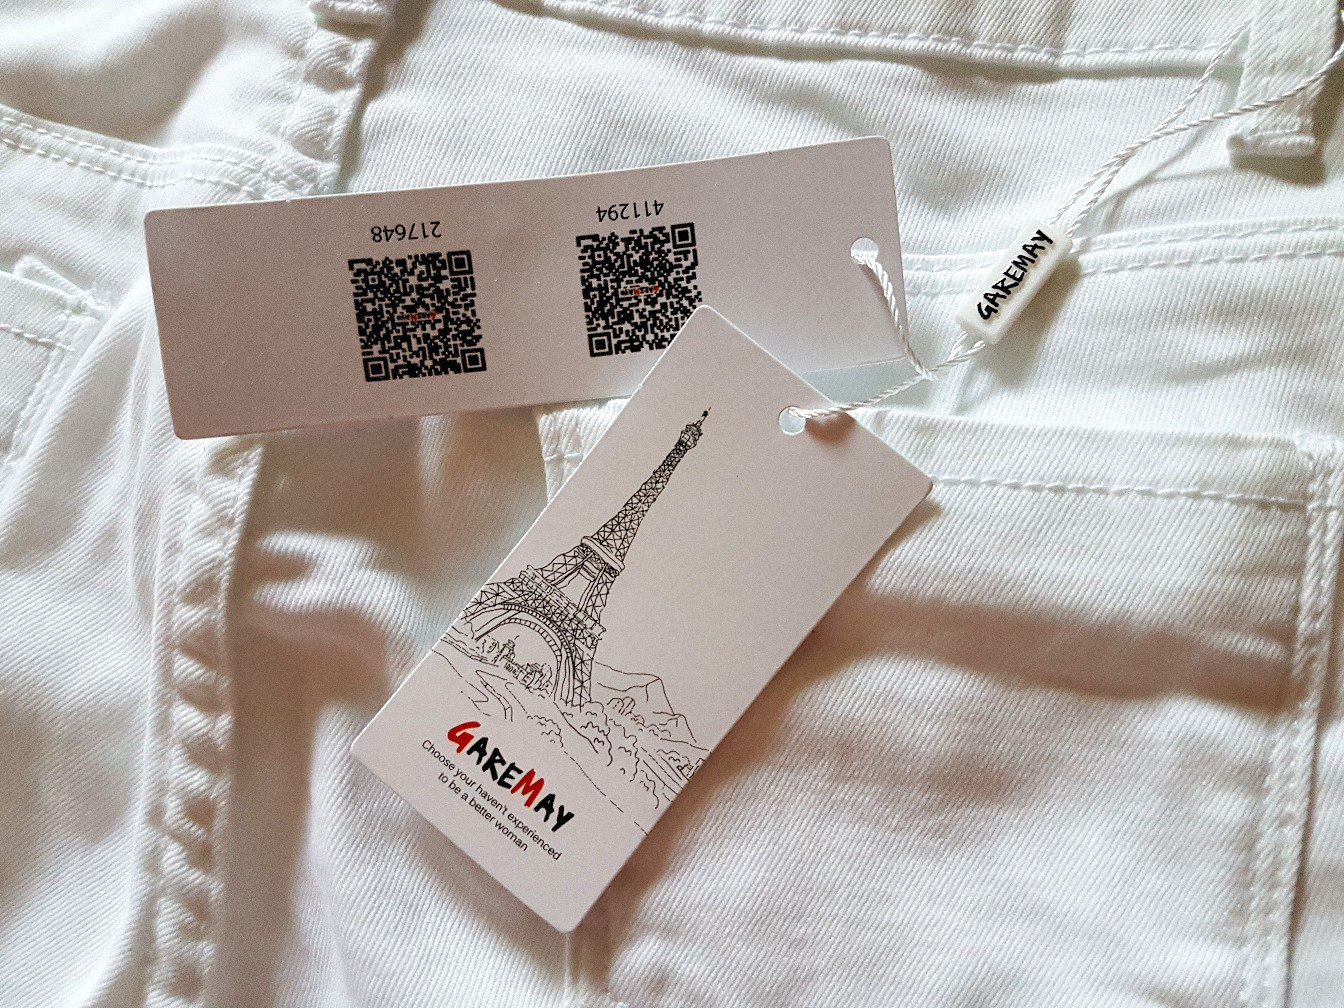 Белые брюки скинни с разрезами на коленях от бренда Garemay